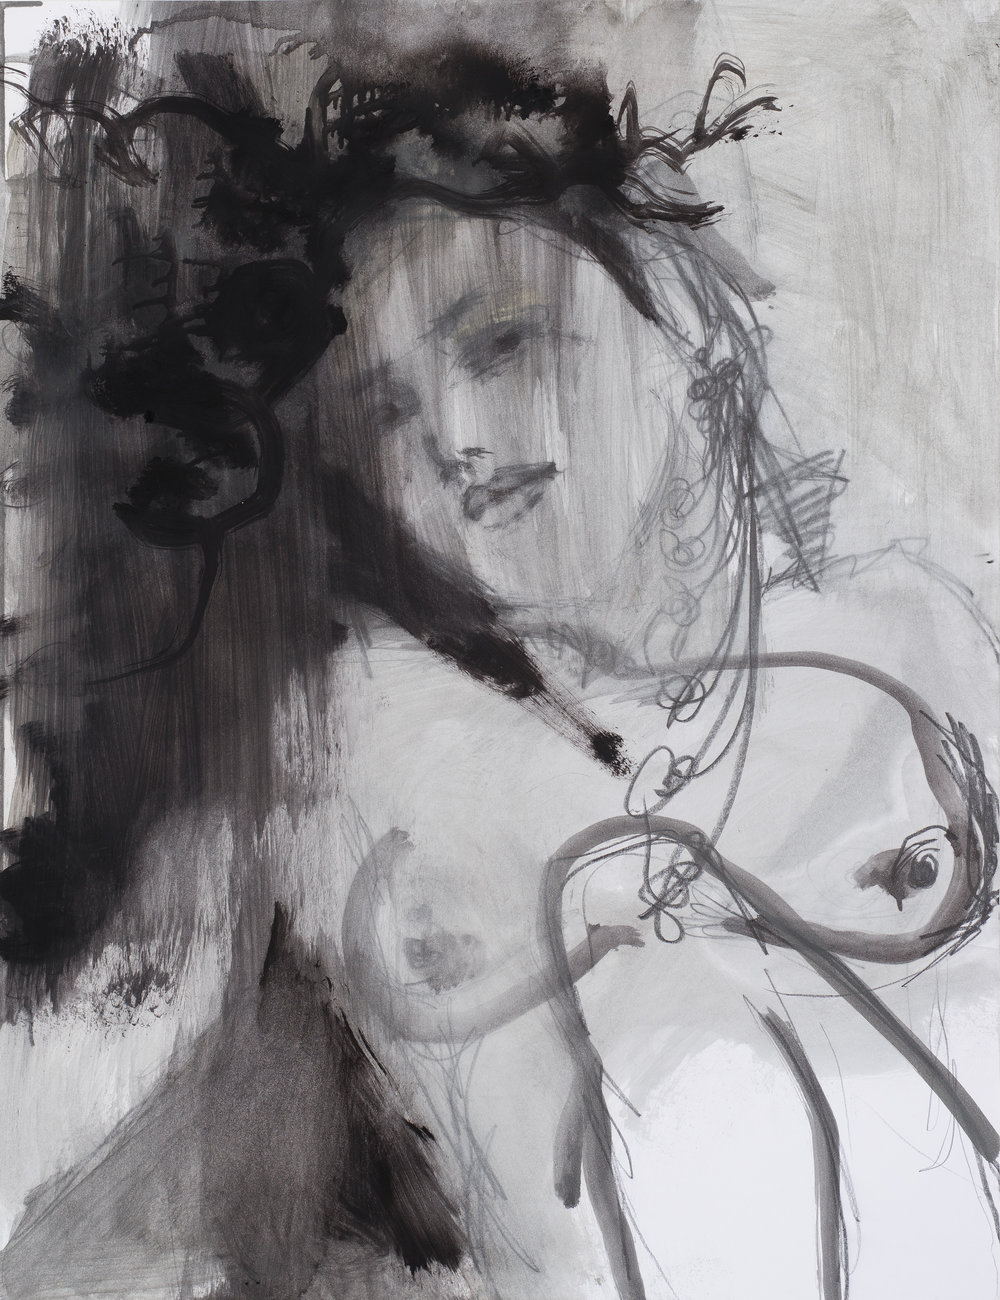 Eros couronné de roses 8 - 201650 x 65 cm